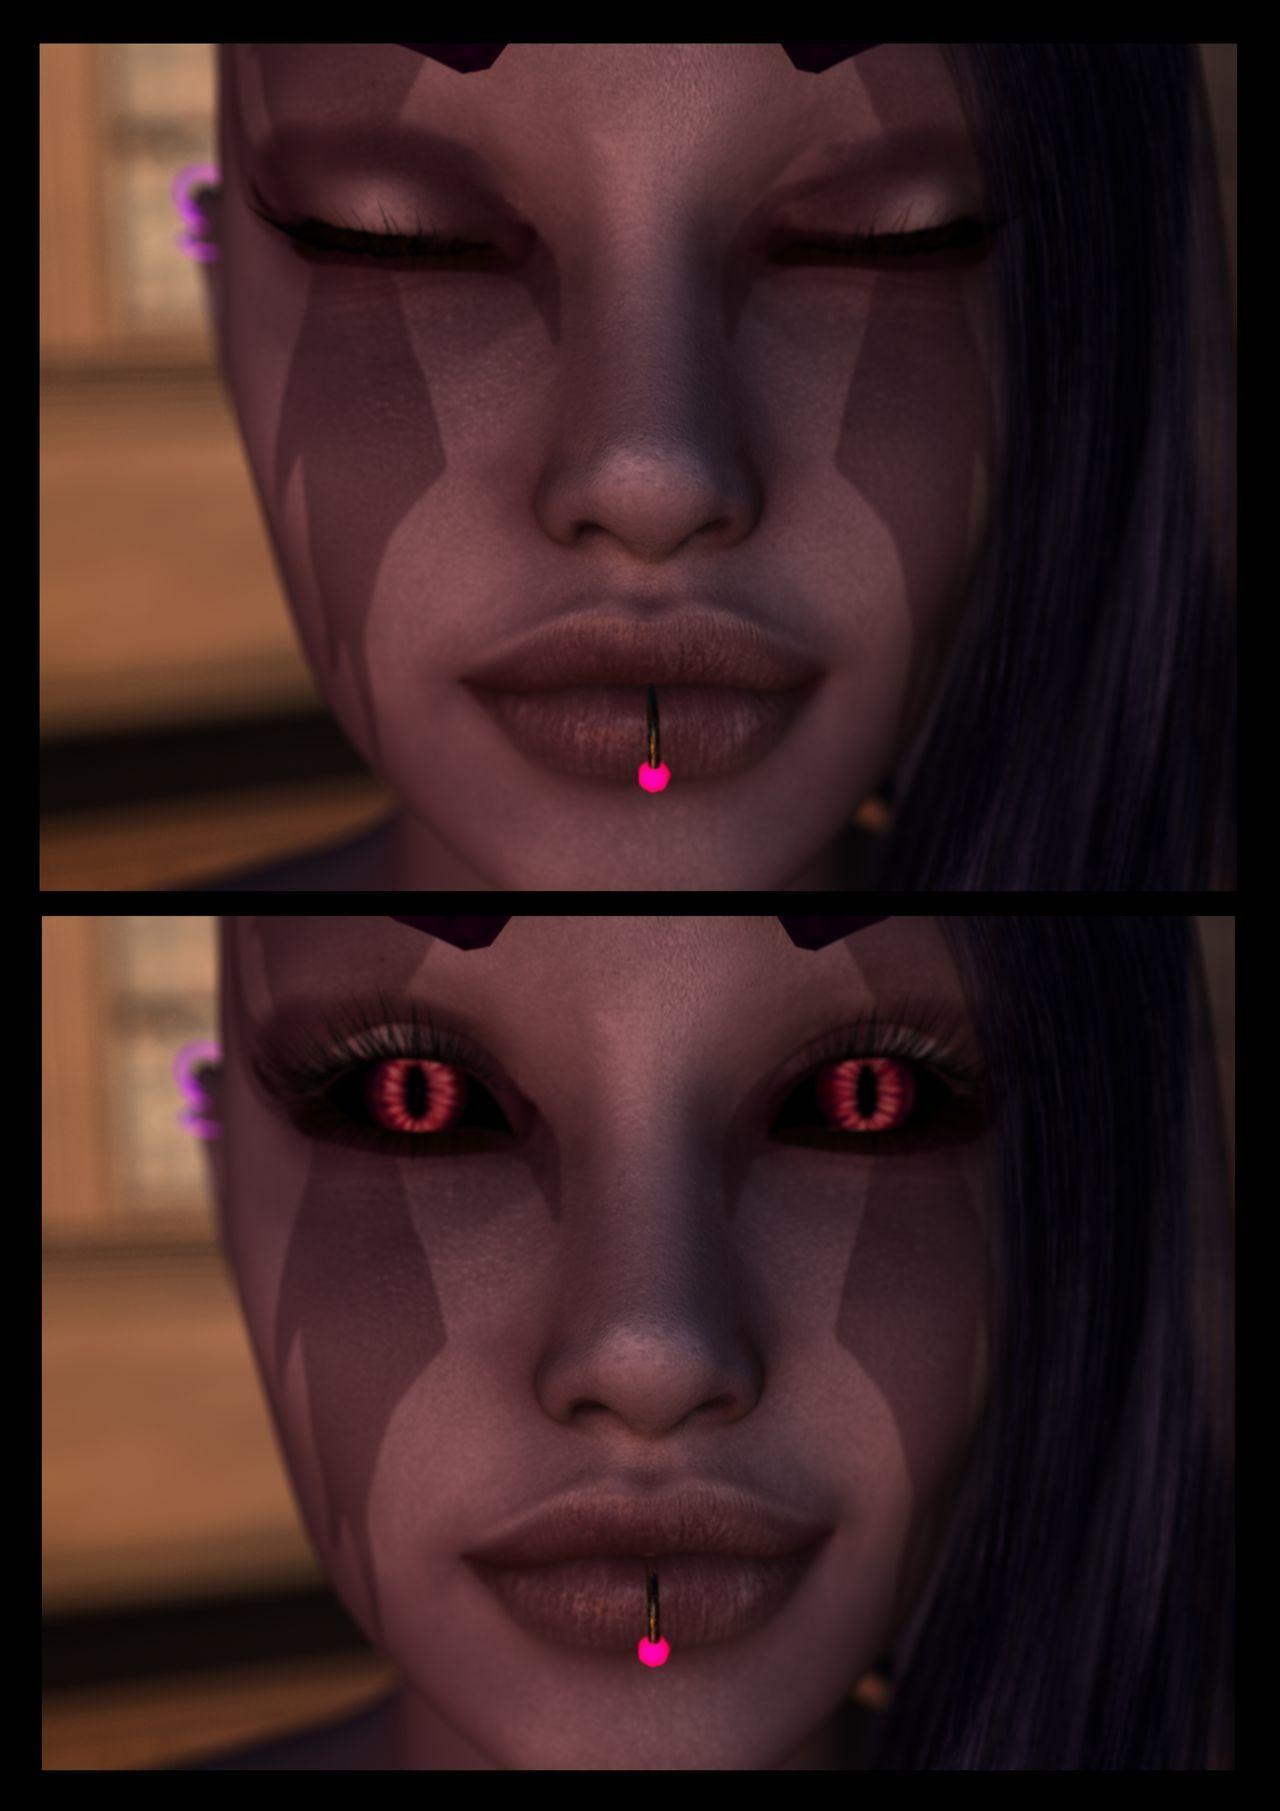 [Shinra-kun] Legion: Thrall of the Mask - Part 1 - part 5